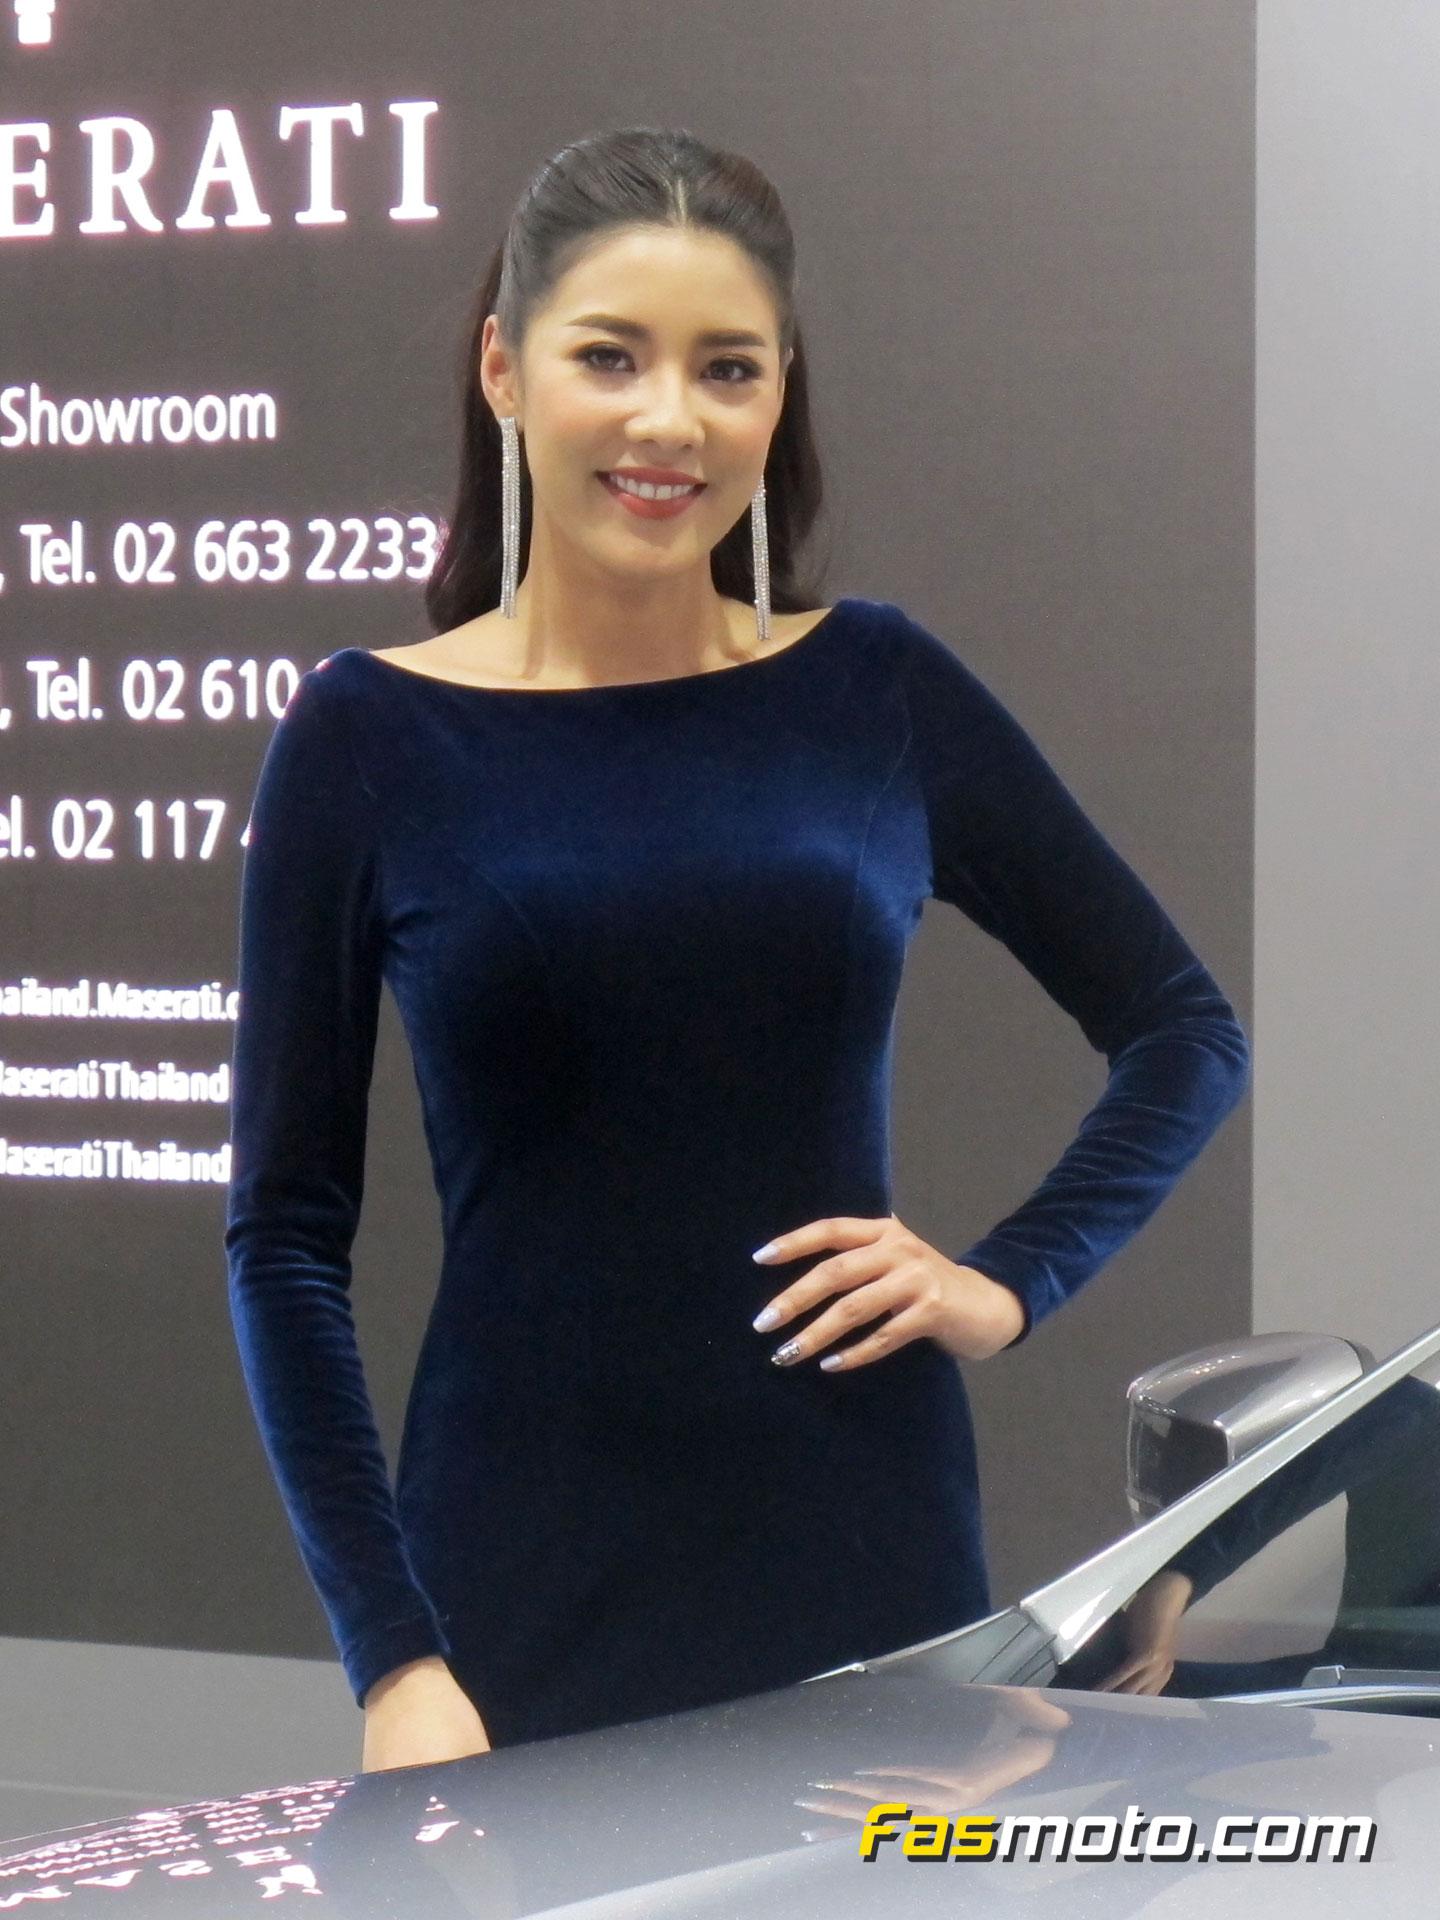 Maserti model